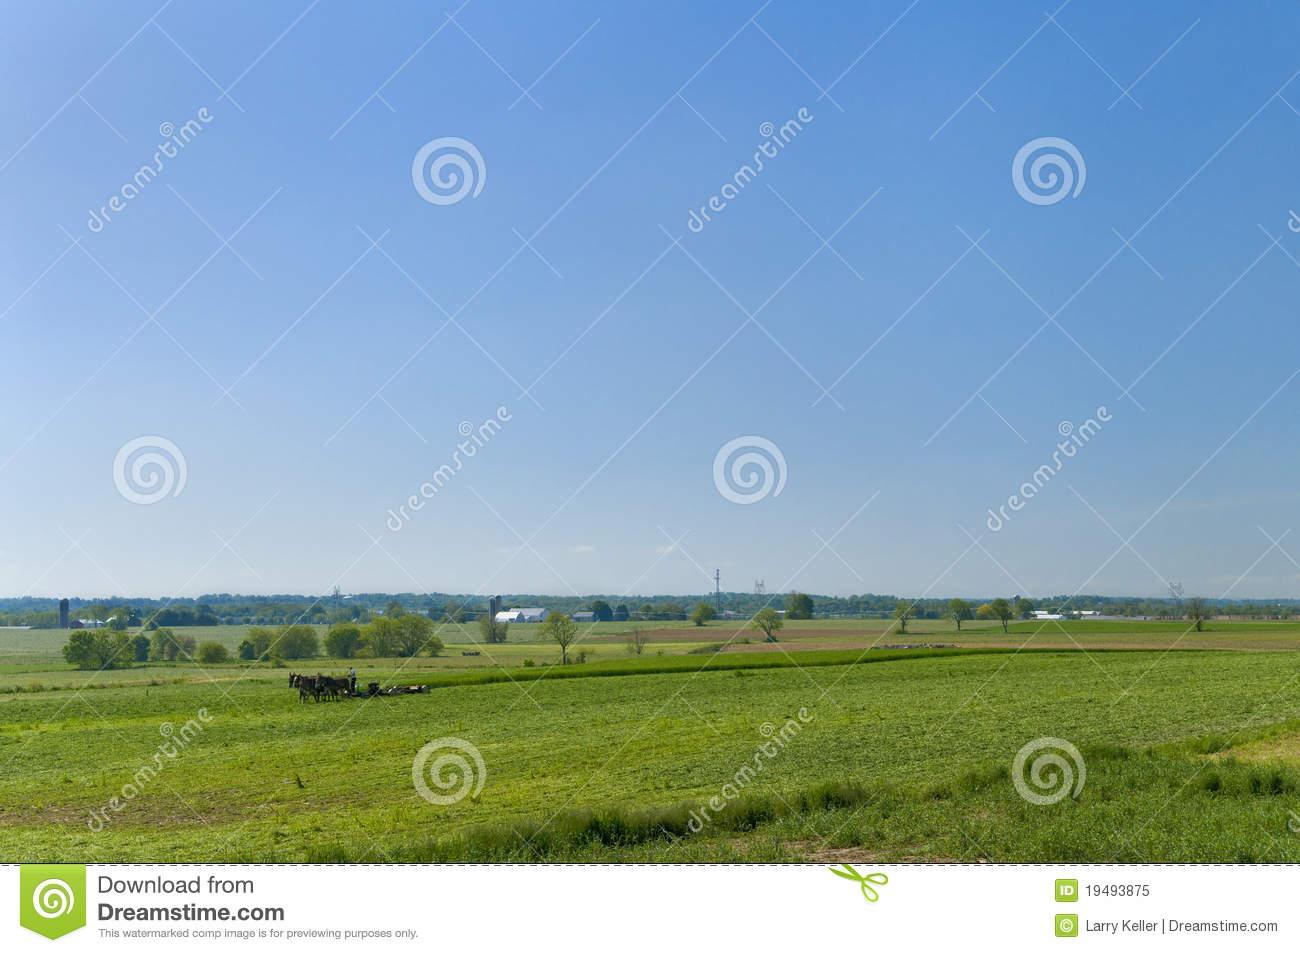 Amish Dairy Farm Clipart.